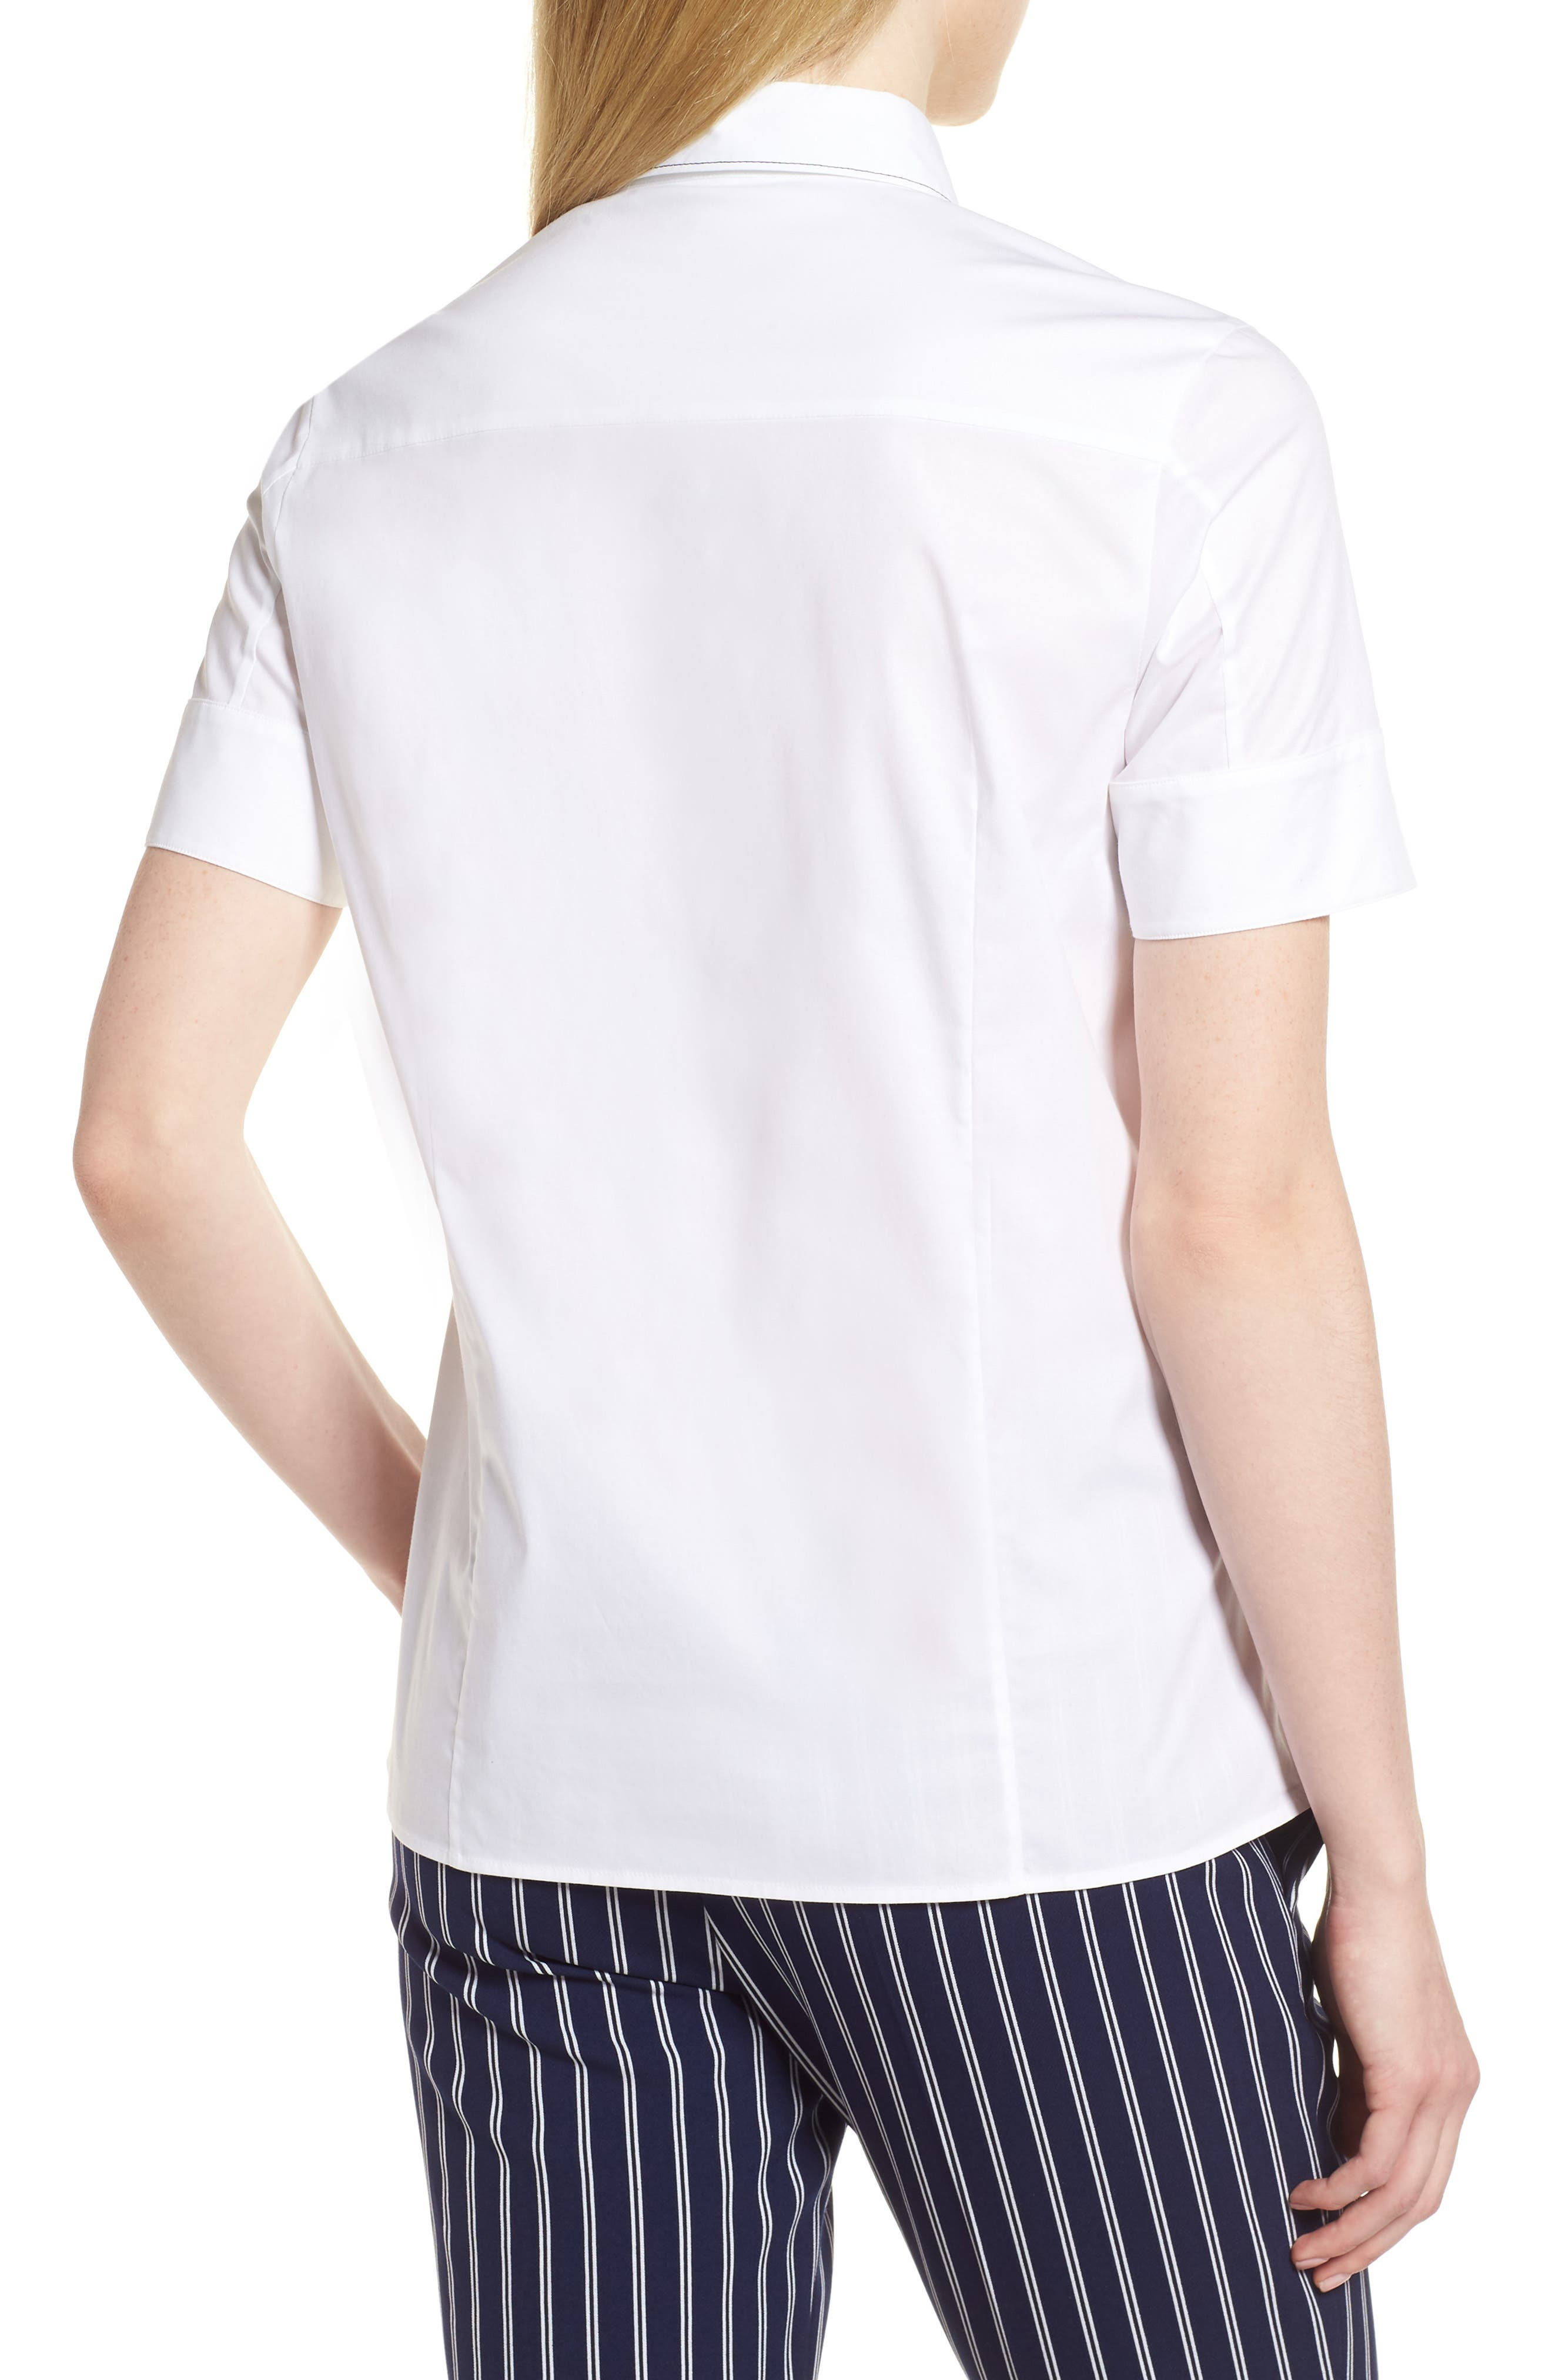 Balasera Stretch Cotton Blouse,                             Alternate thumbnail 2, color,                             White